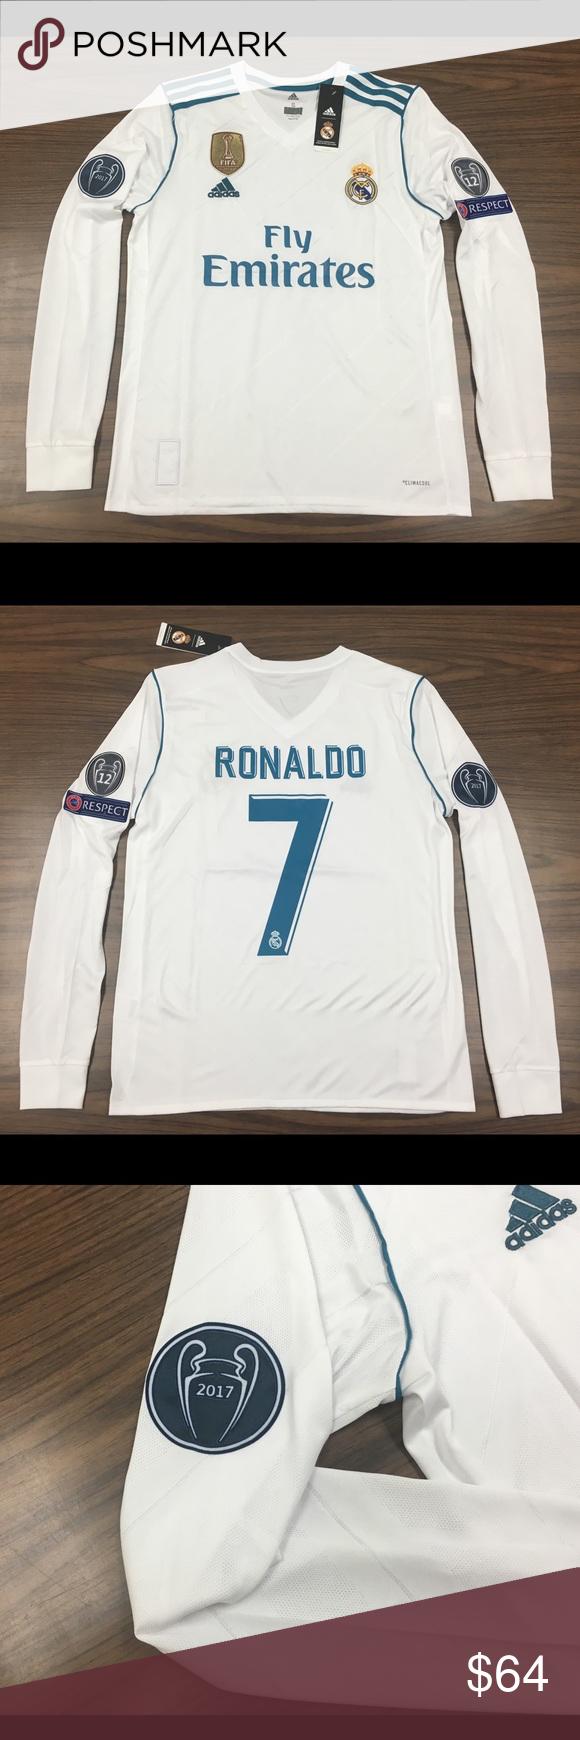 half off aeaba 270b9 Real Madrid Ronaldo White long sleeve jersey 2017 Arguably ...